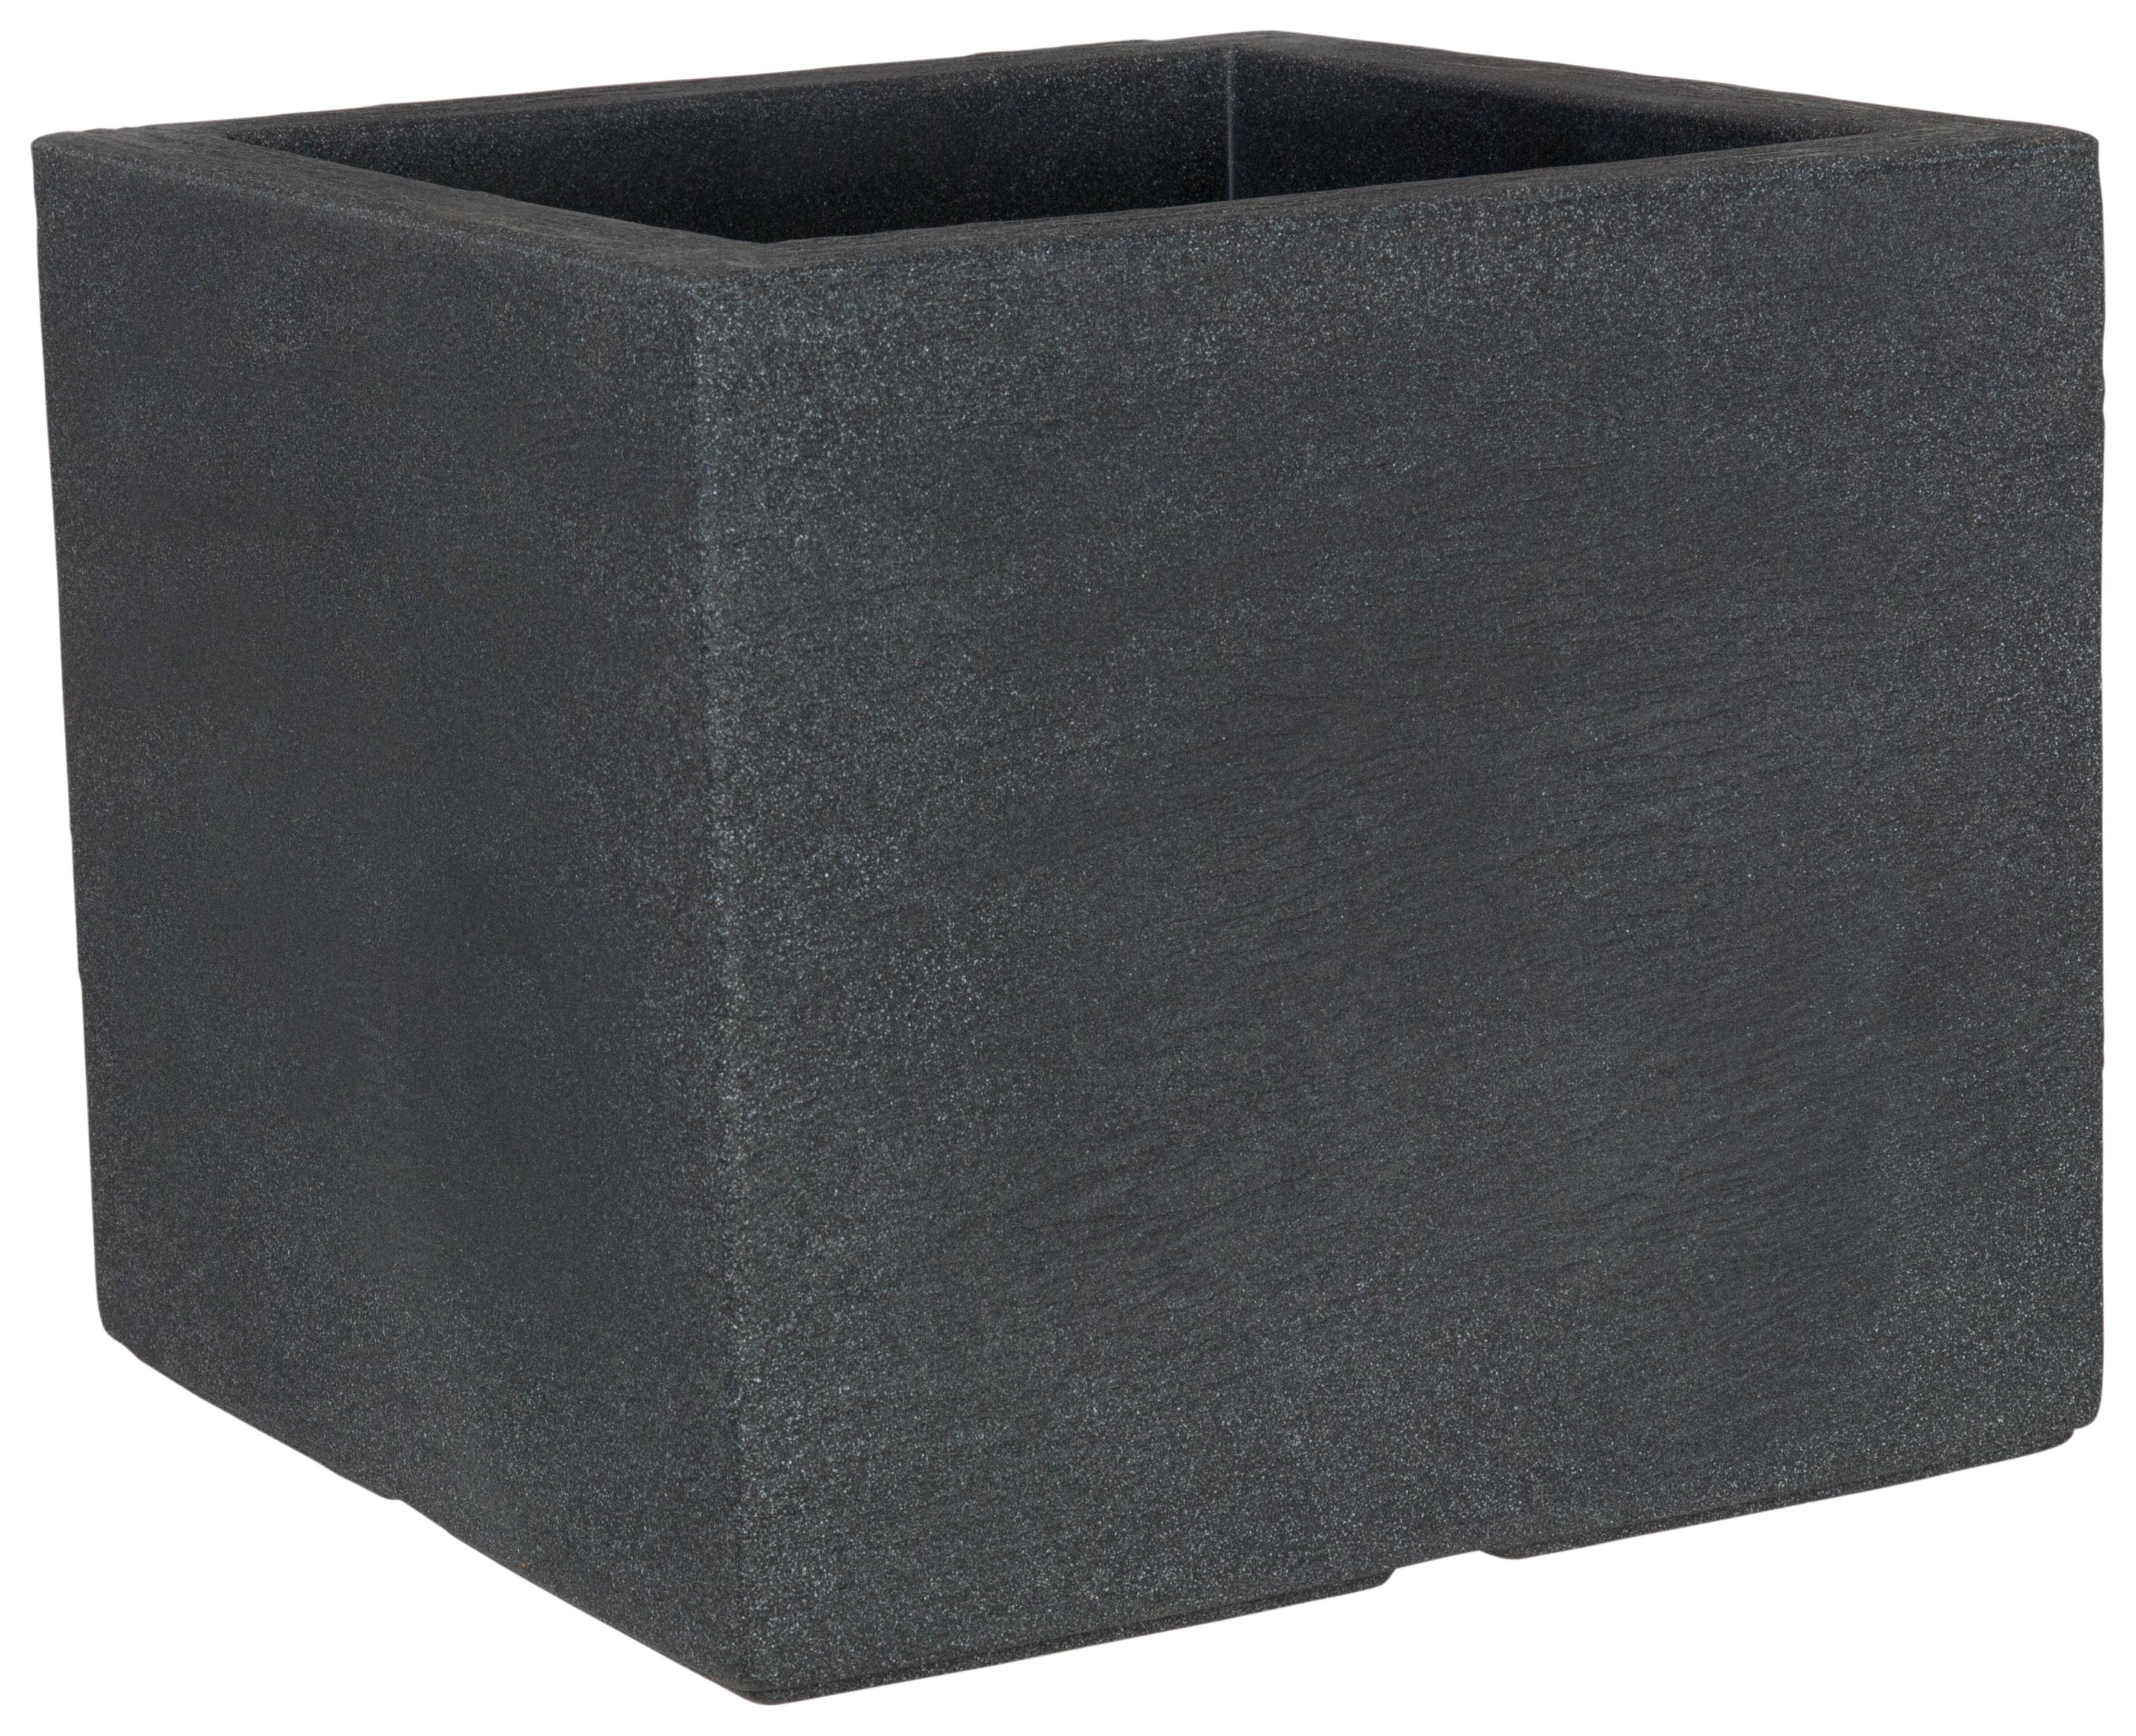 pflanzkasten pflanzgef kubus 40x40 anthrazit bei. Black Bedroom Furniture Sets. Home Design Ideas